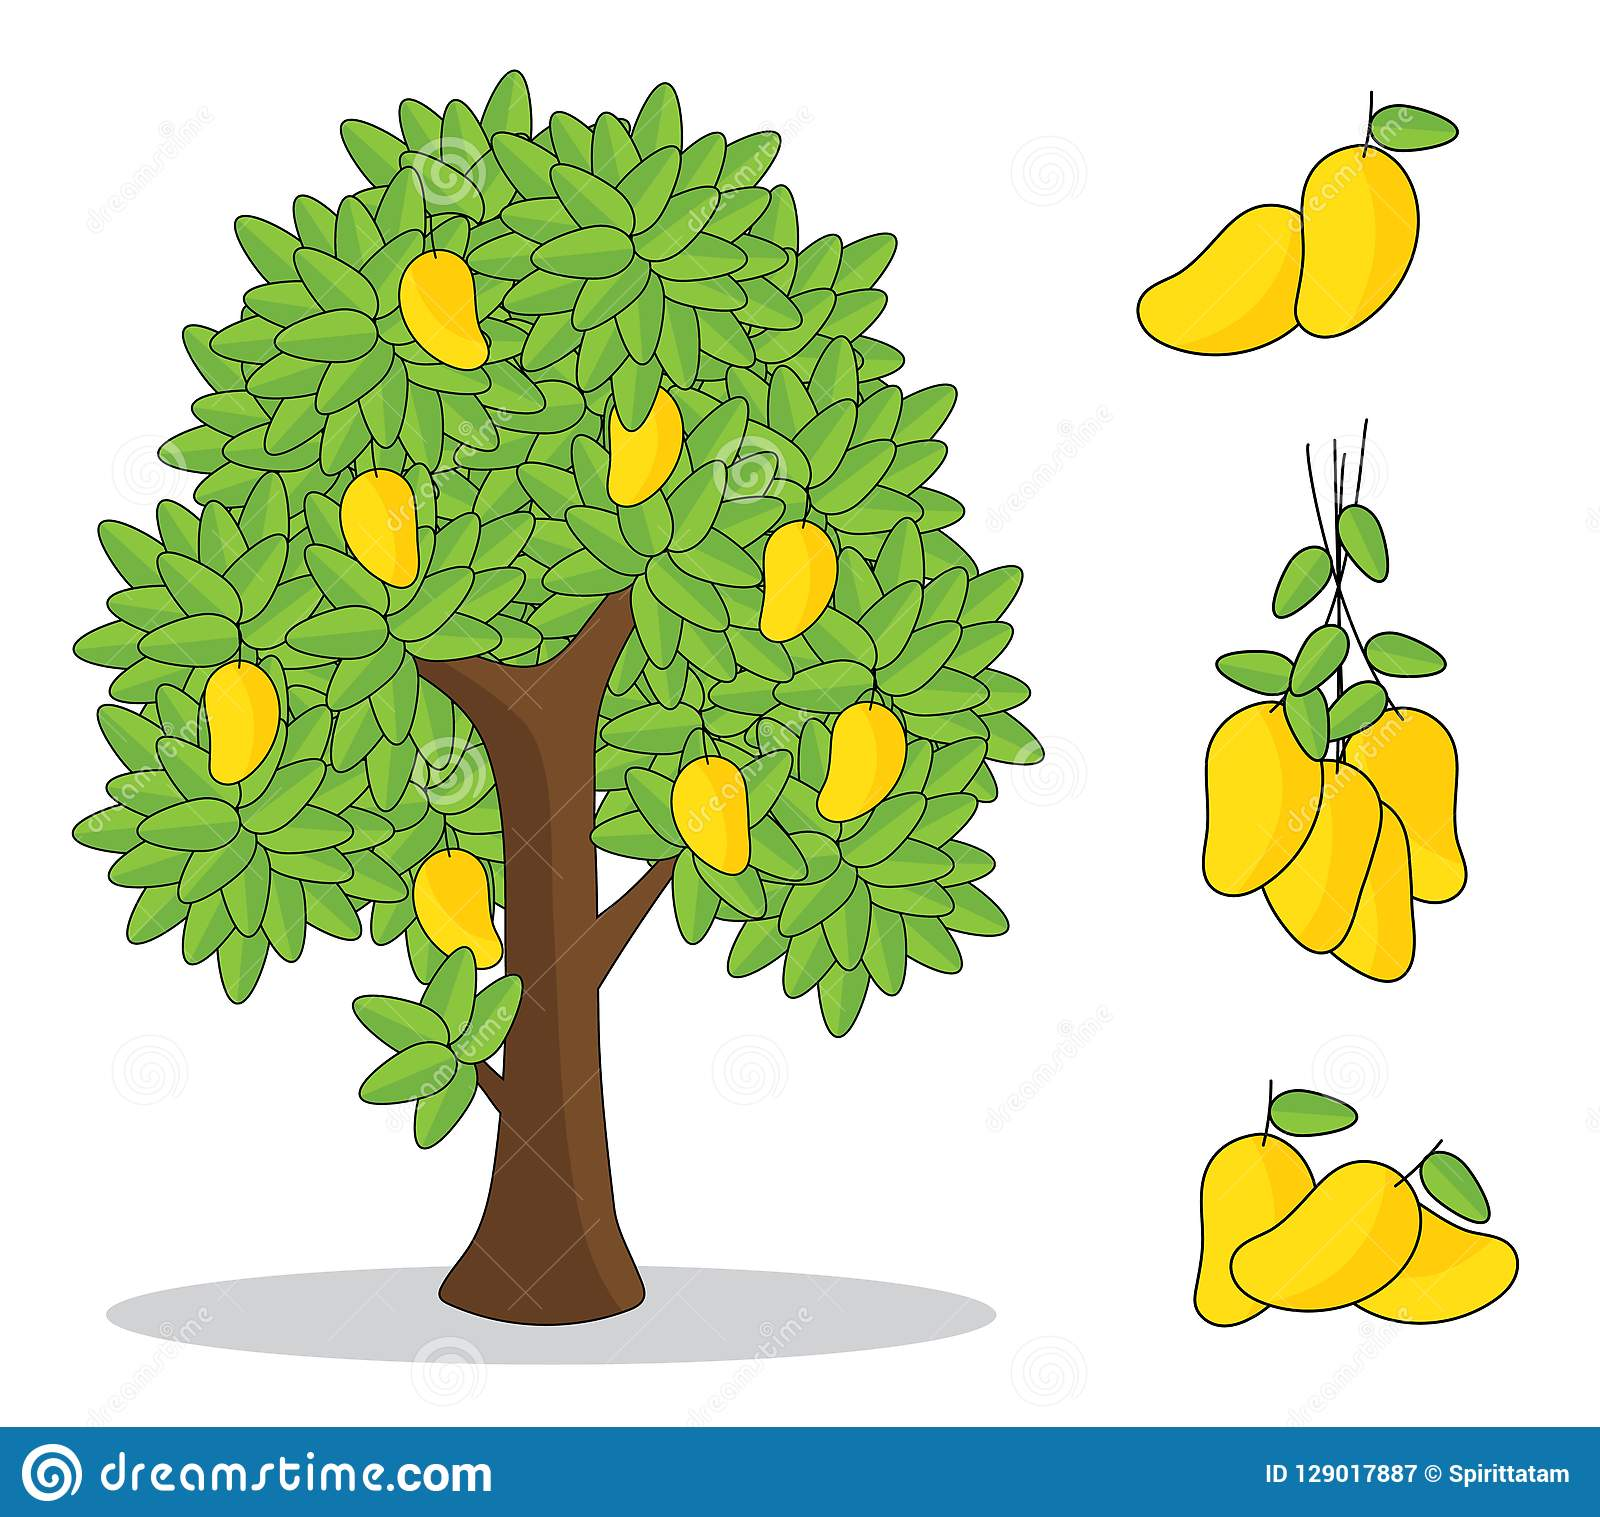 Mango Tree Stock Illustrations 4 231 Mango Tree Stock Illustrations Vectors Clipart Dreamstime